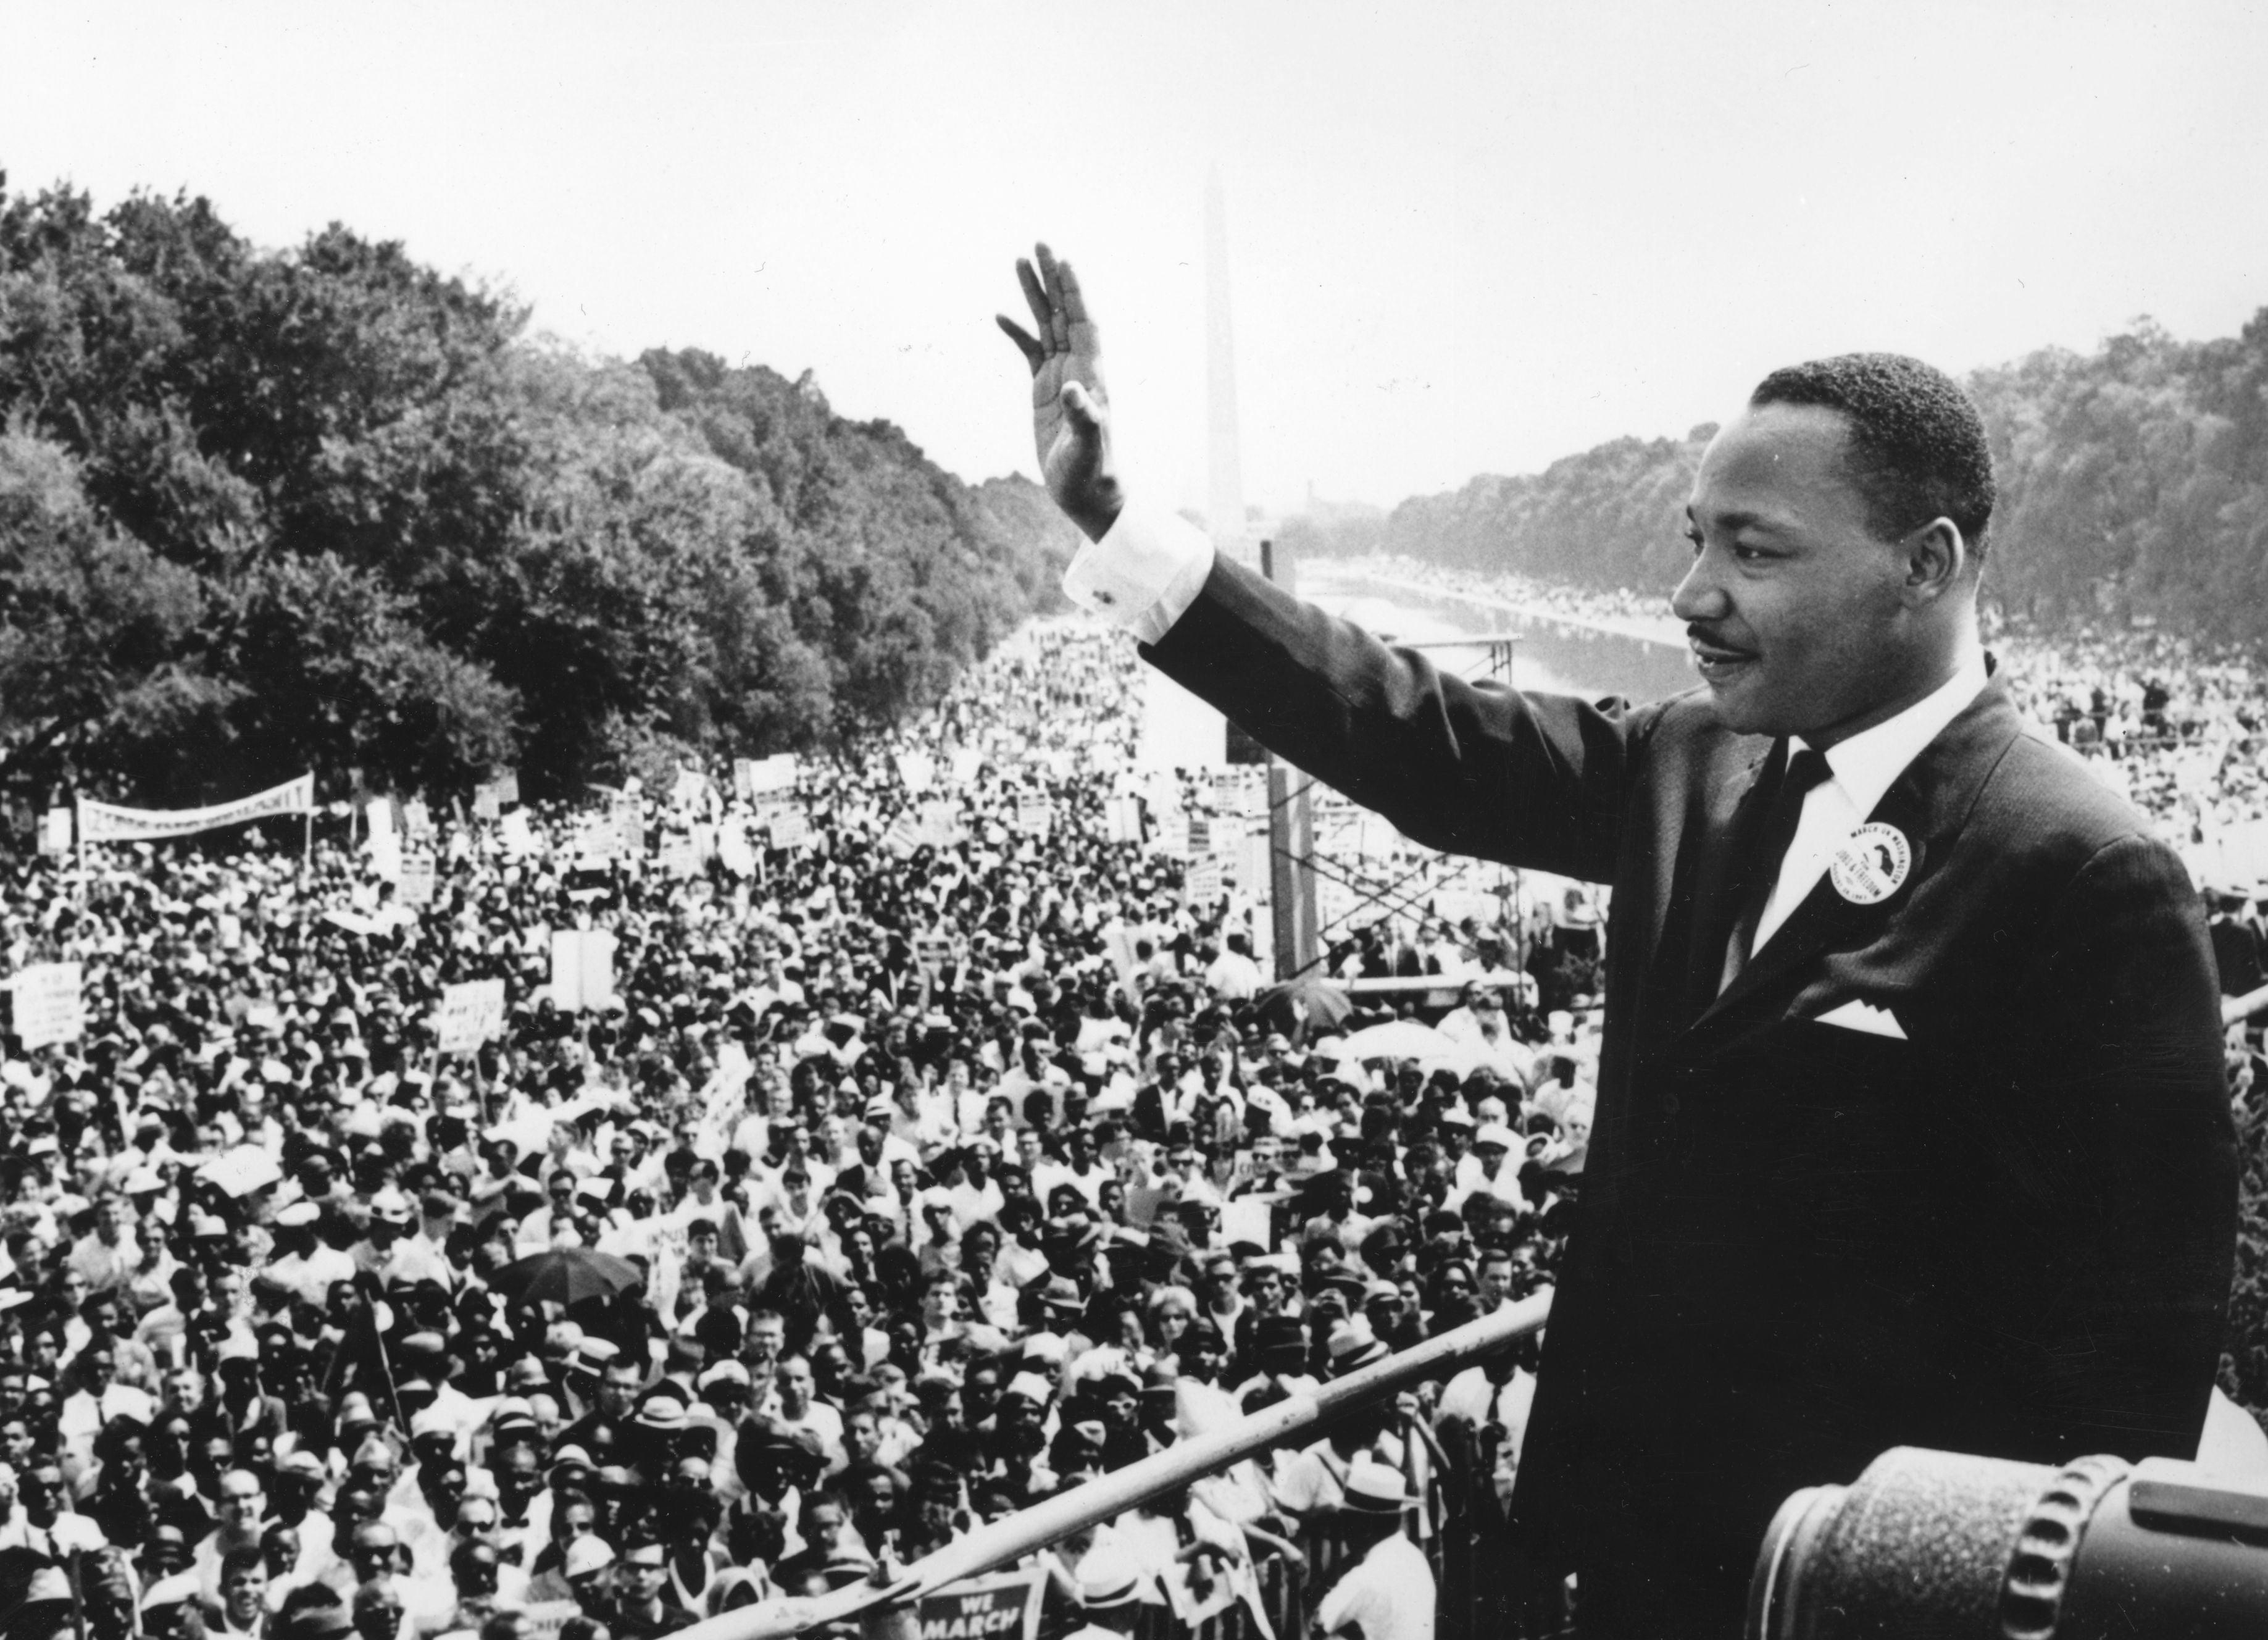 Finding A Way In Trump's America Through MLK's 'Drum Major Instinct'